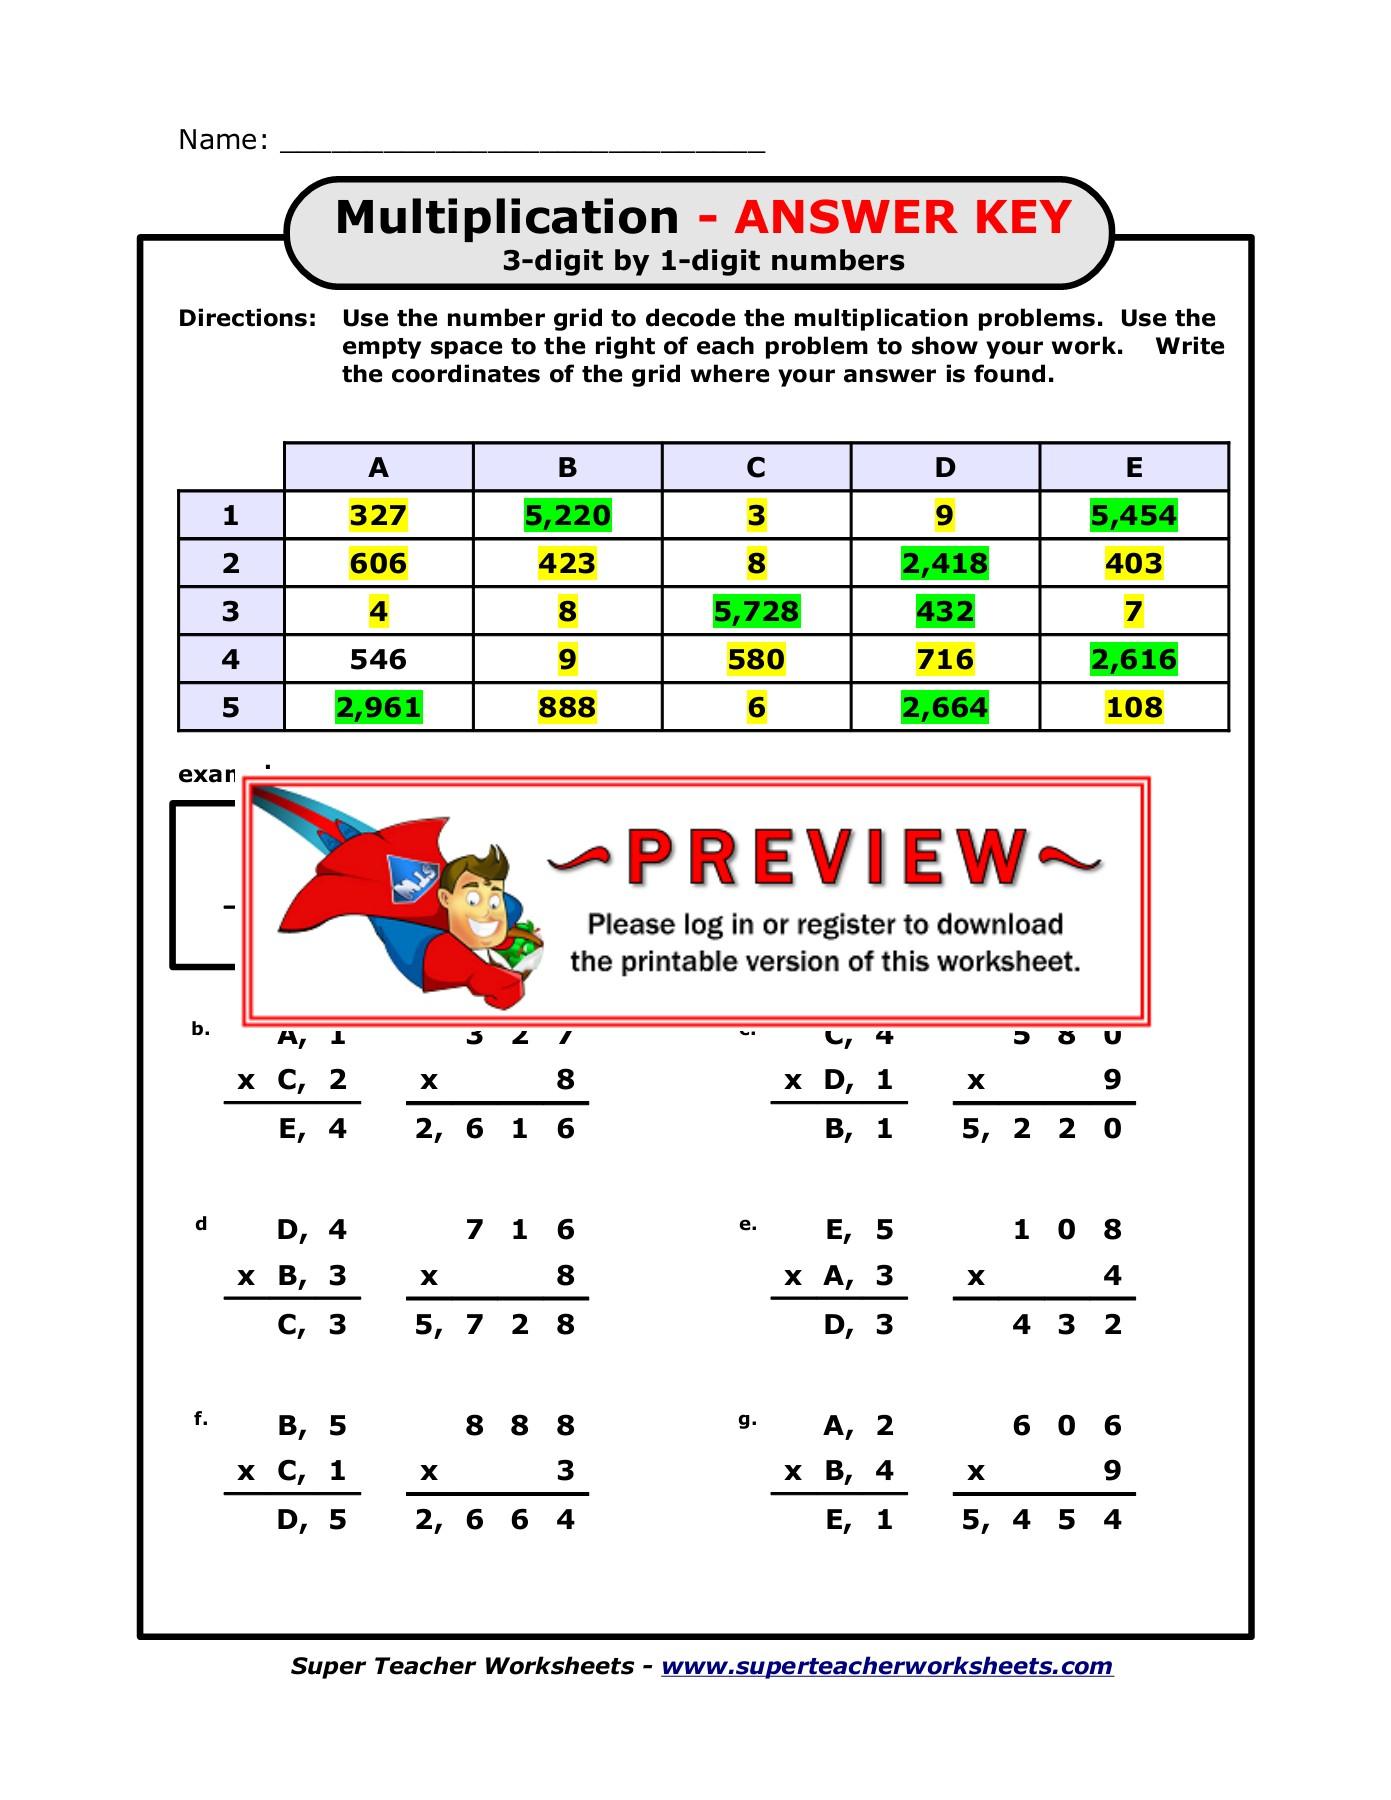 Super Teacher Worksheets Multiplication